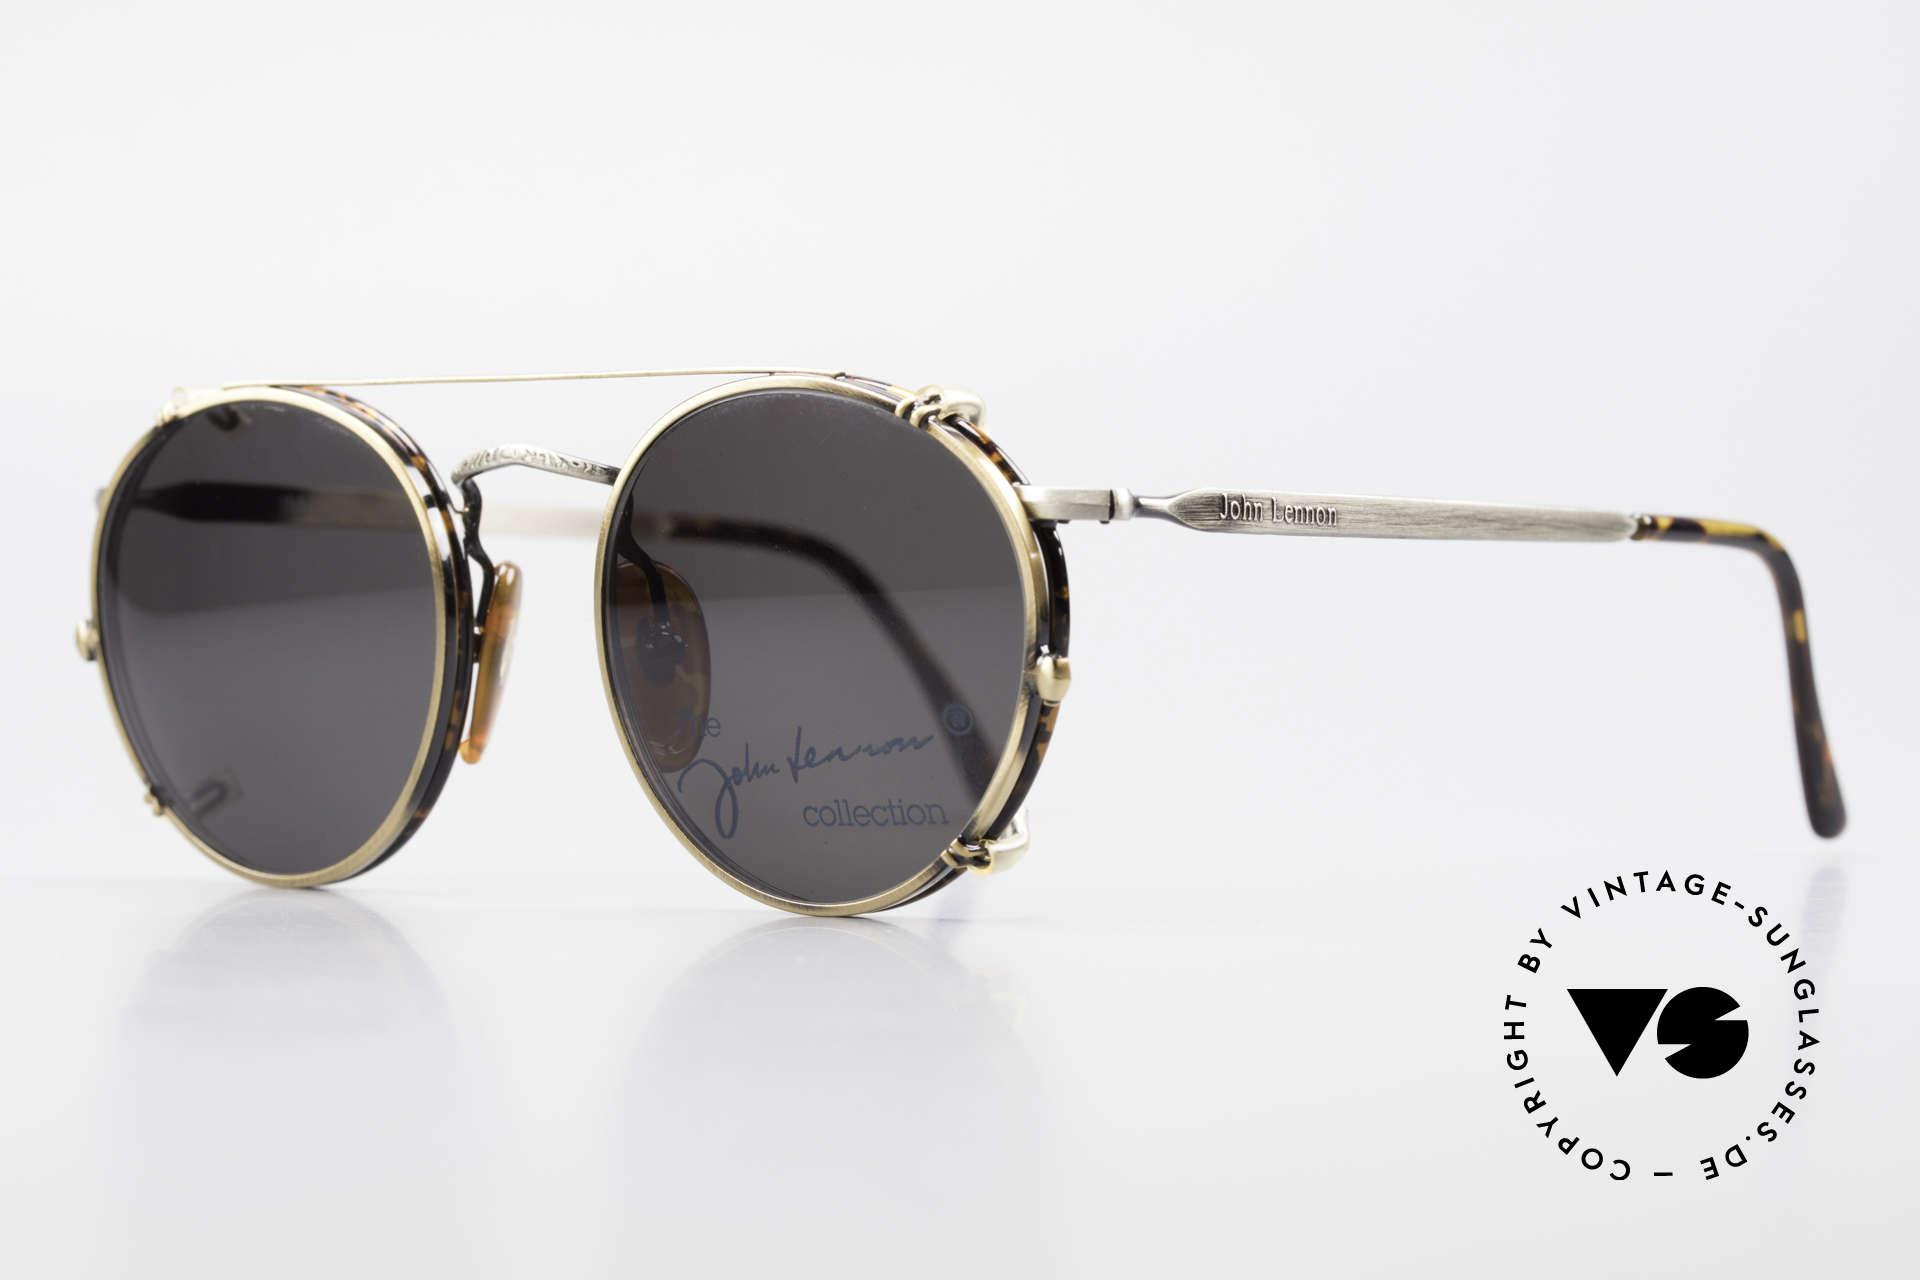 John Lennon - Imagine Panto Glasses With Clip On, all models named after famous J.Lennon / Beatles songs, Made for Men and Women